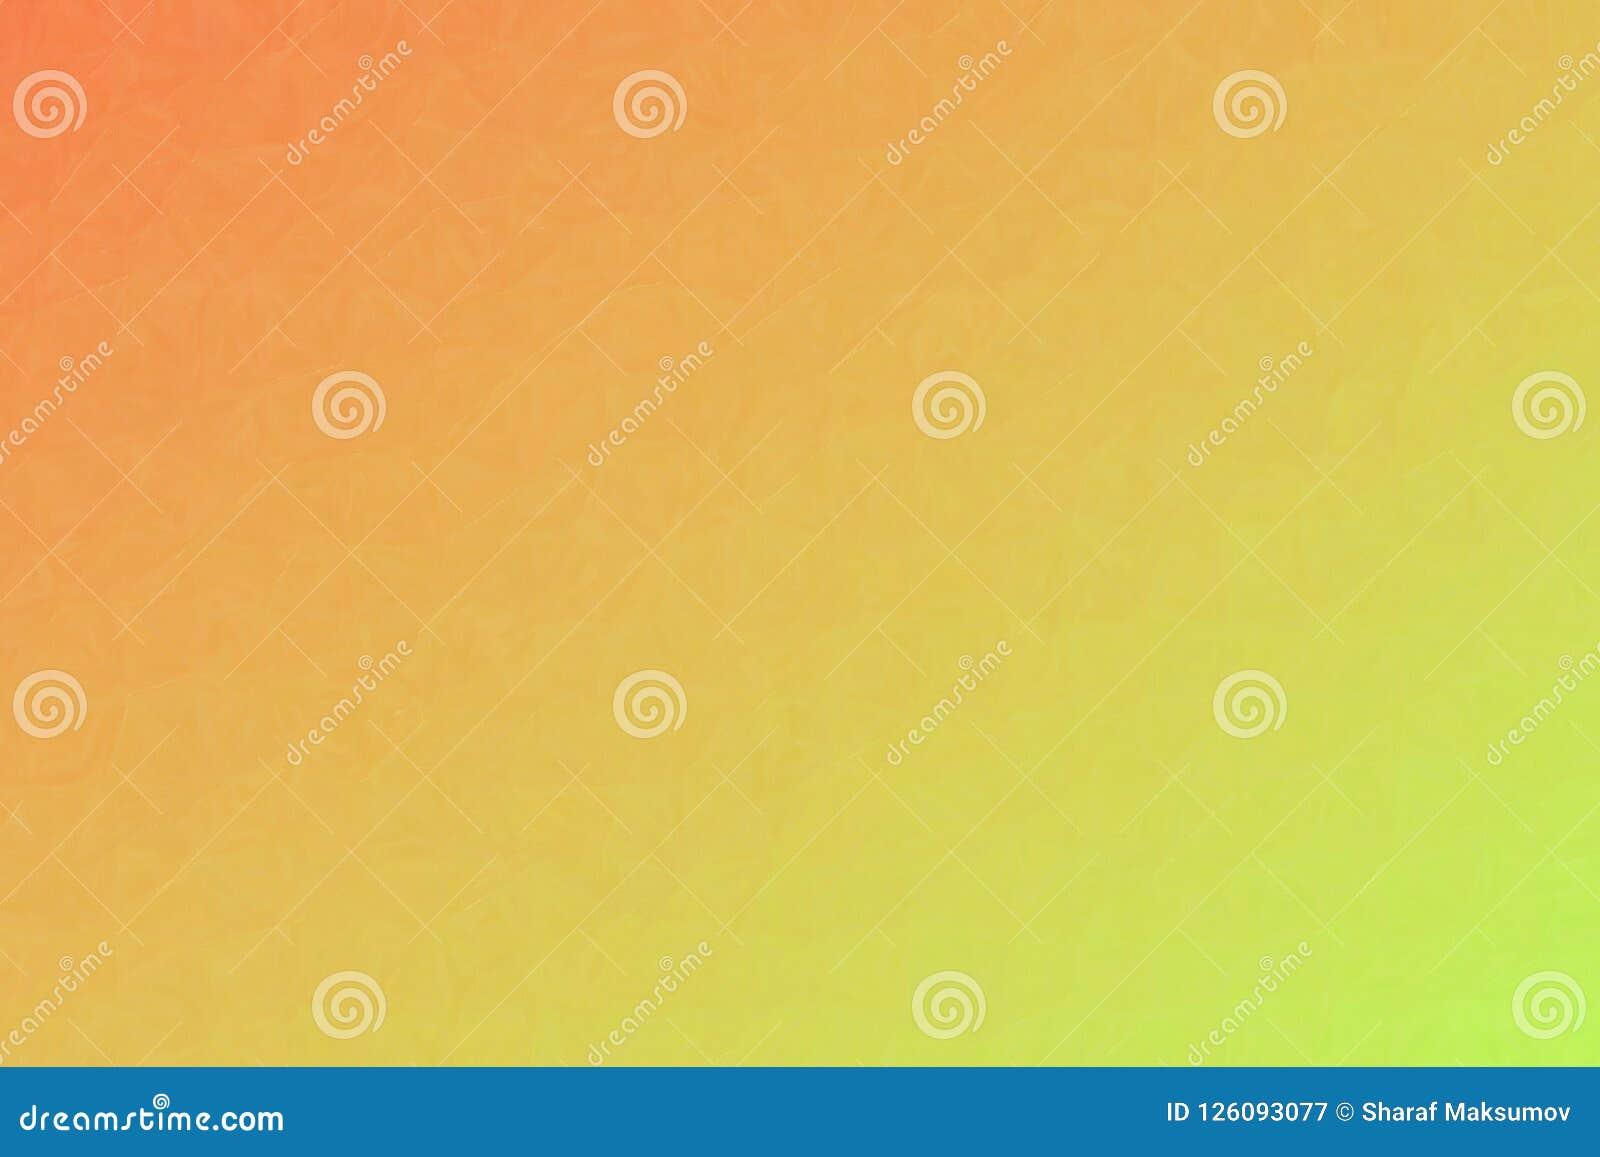 Orange and green Oil Pastel background illustration.